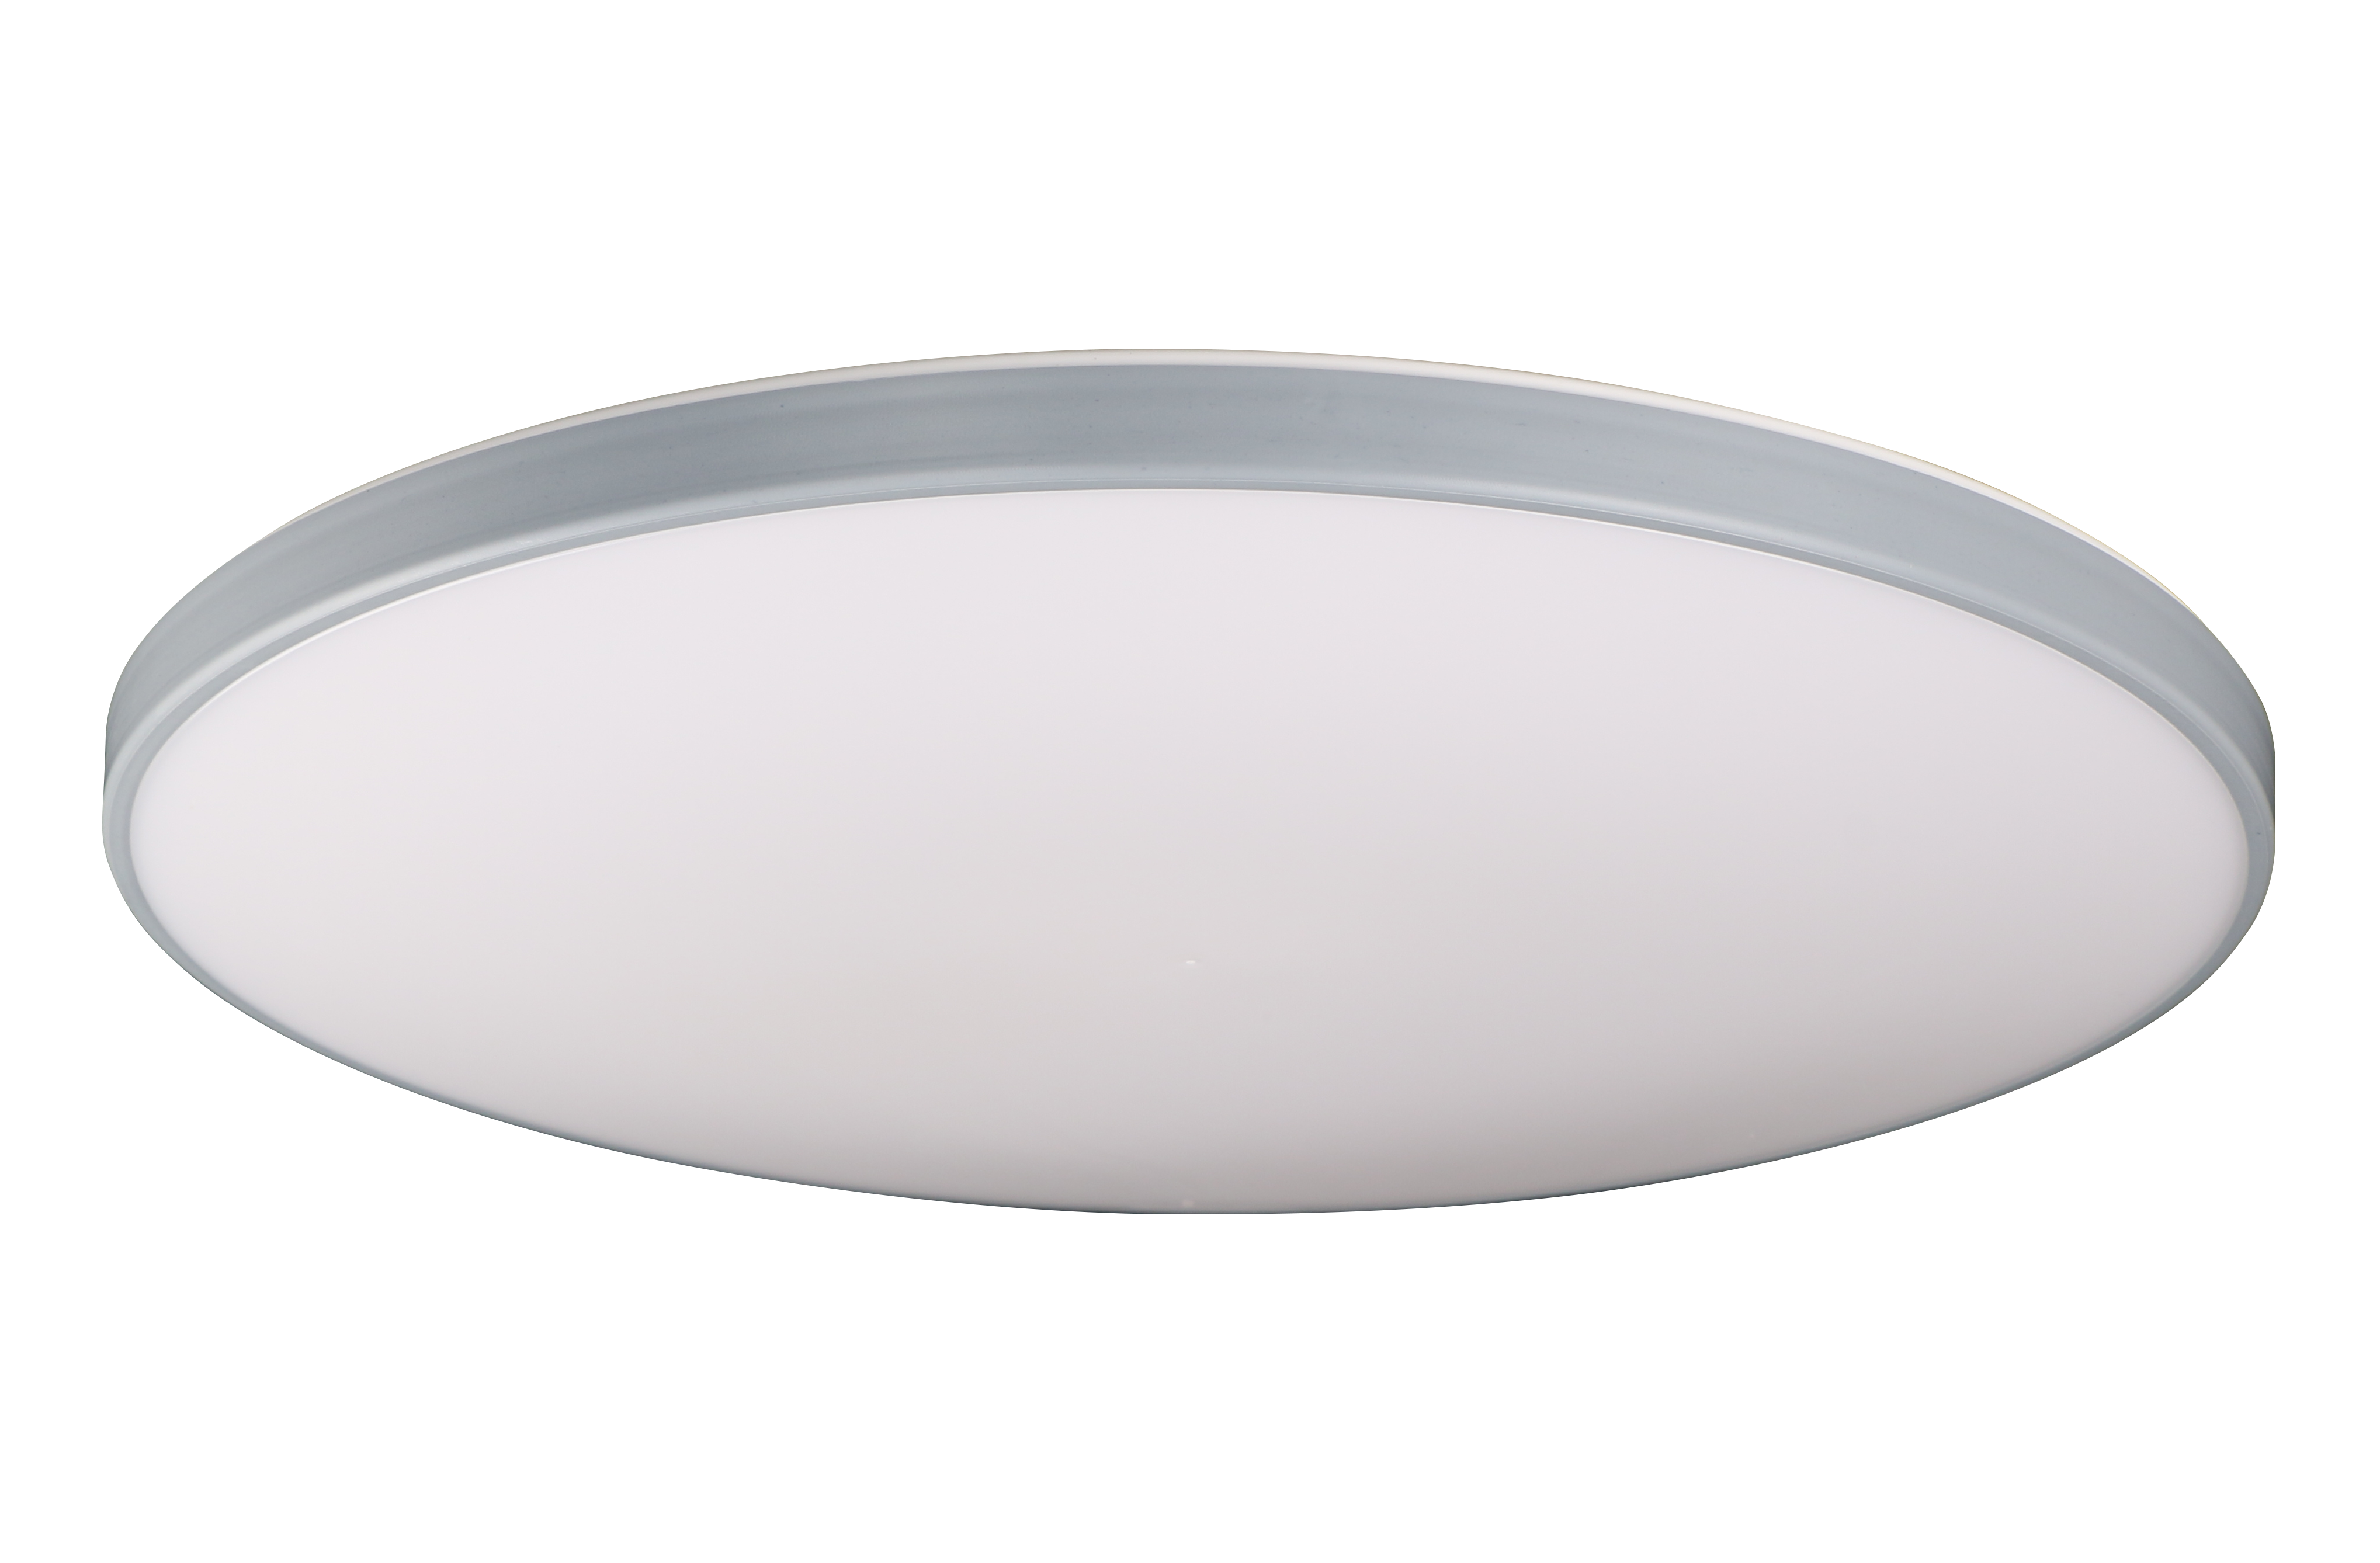 LED室内家用简约圆形三防灯